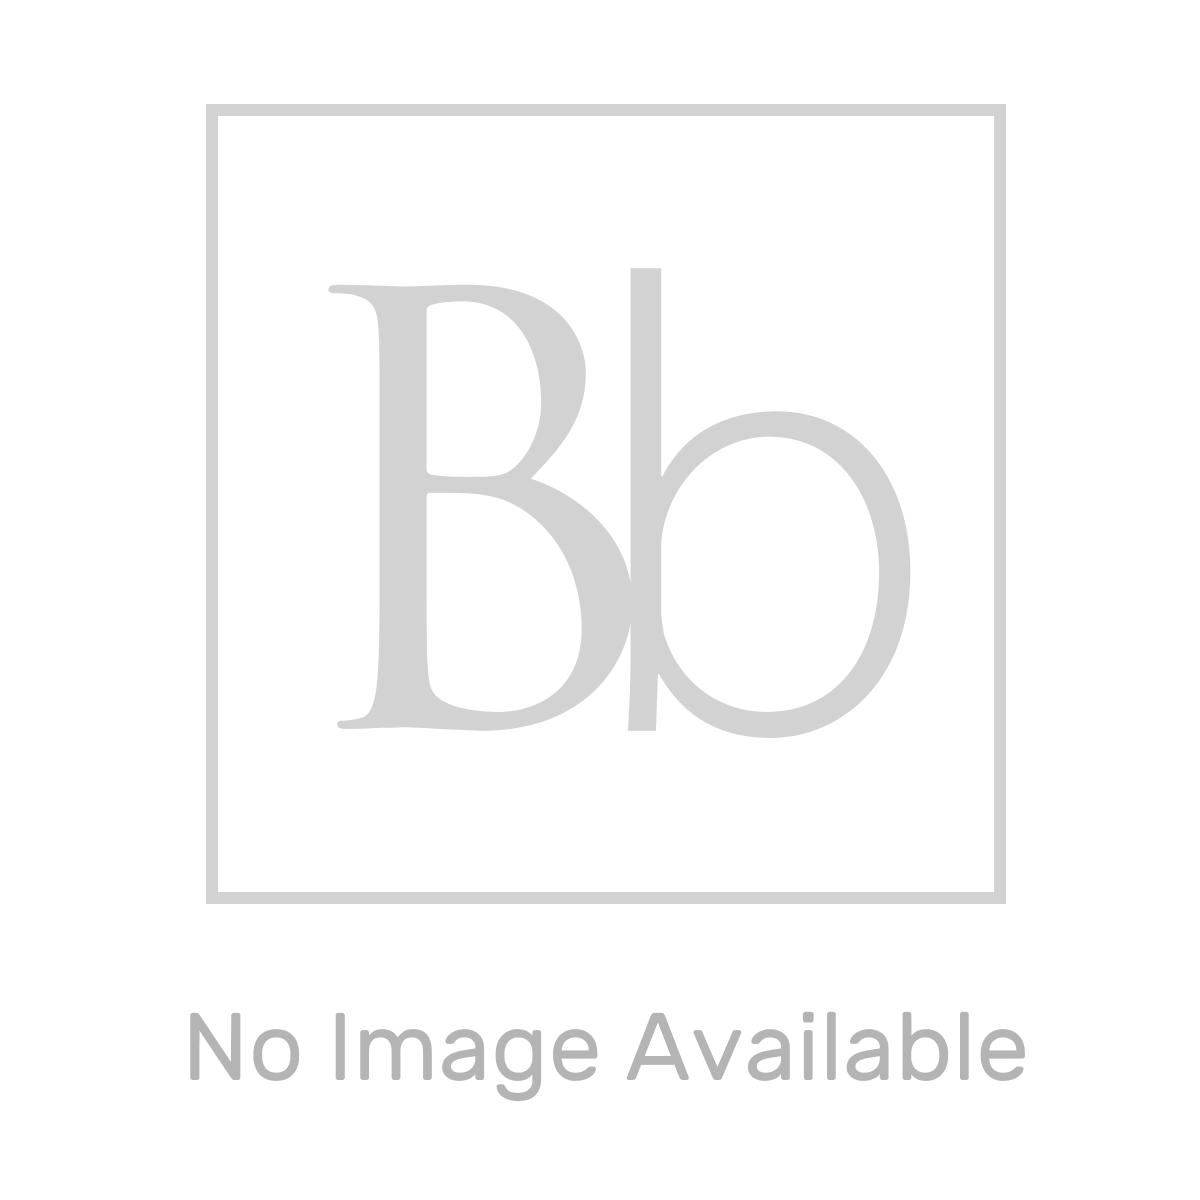 Ikoma White Gloss 4 Drawer Unit Dimensions